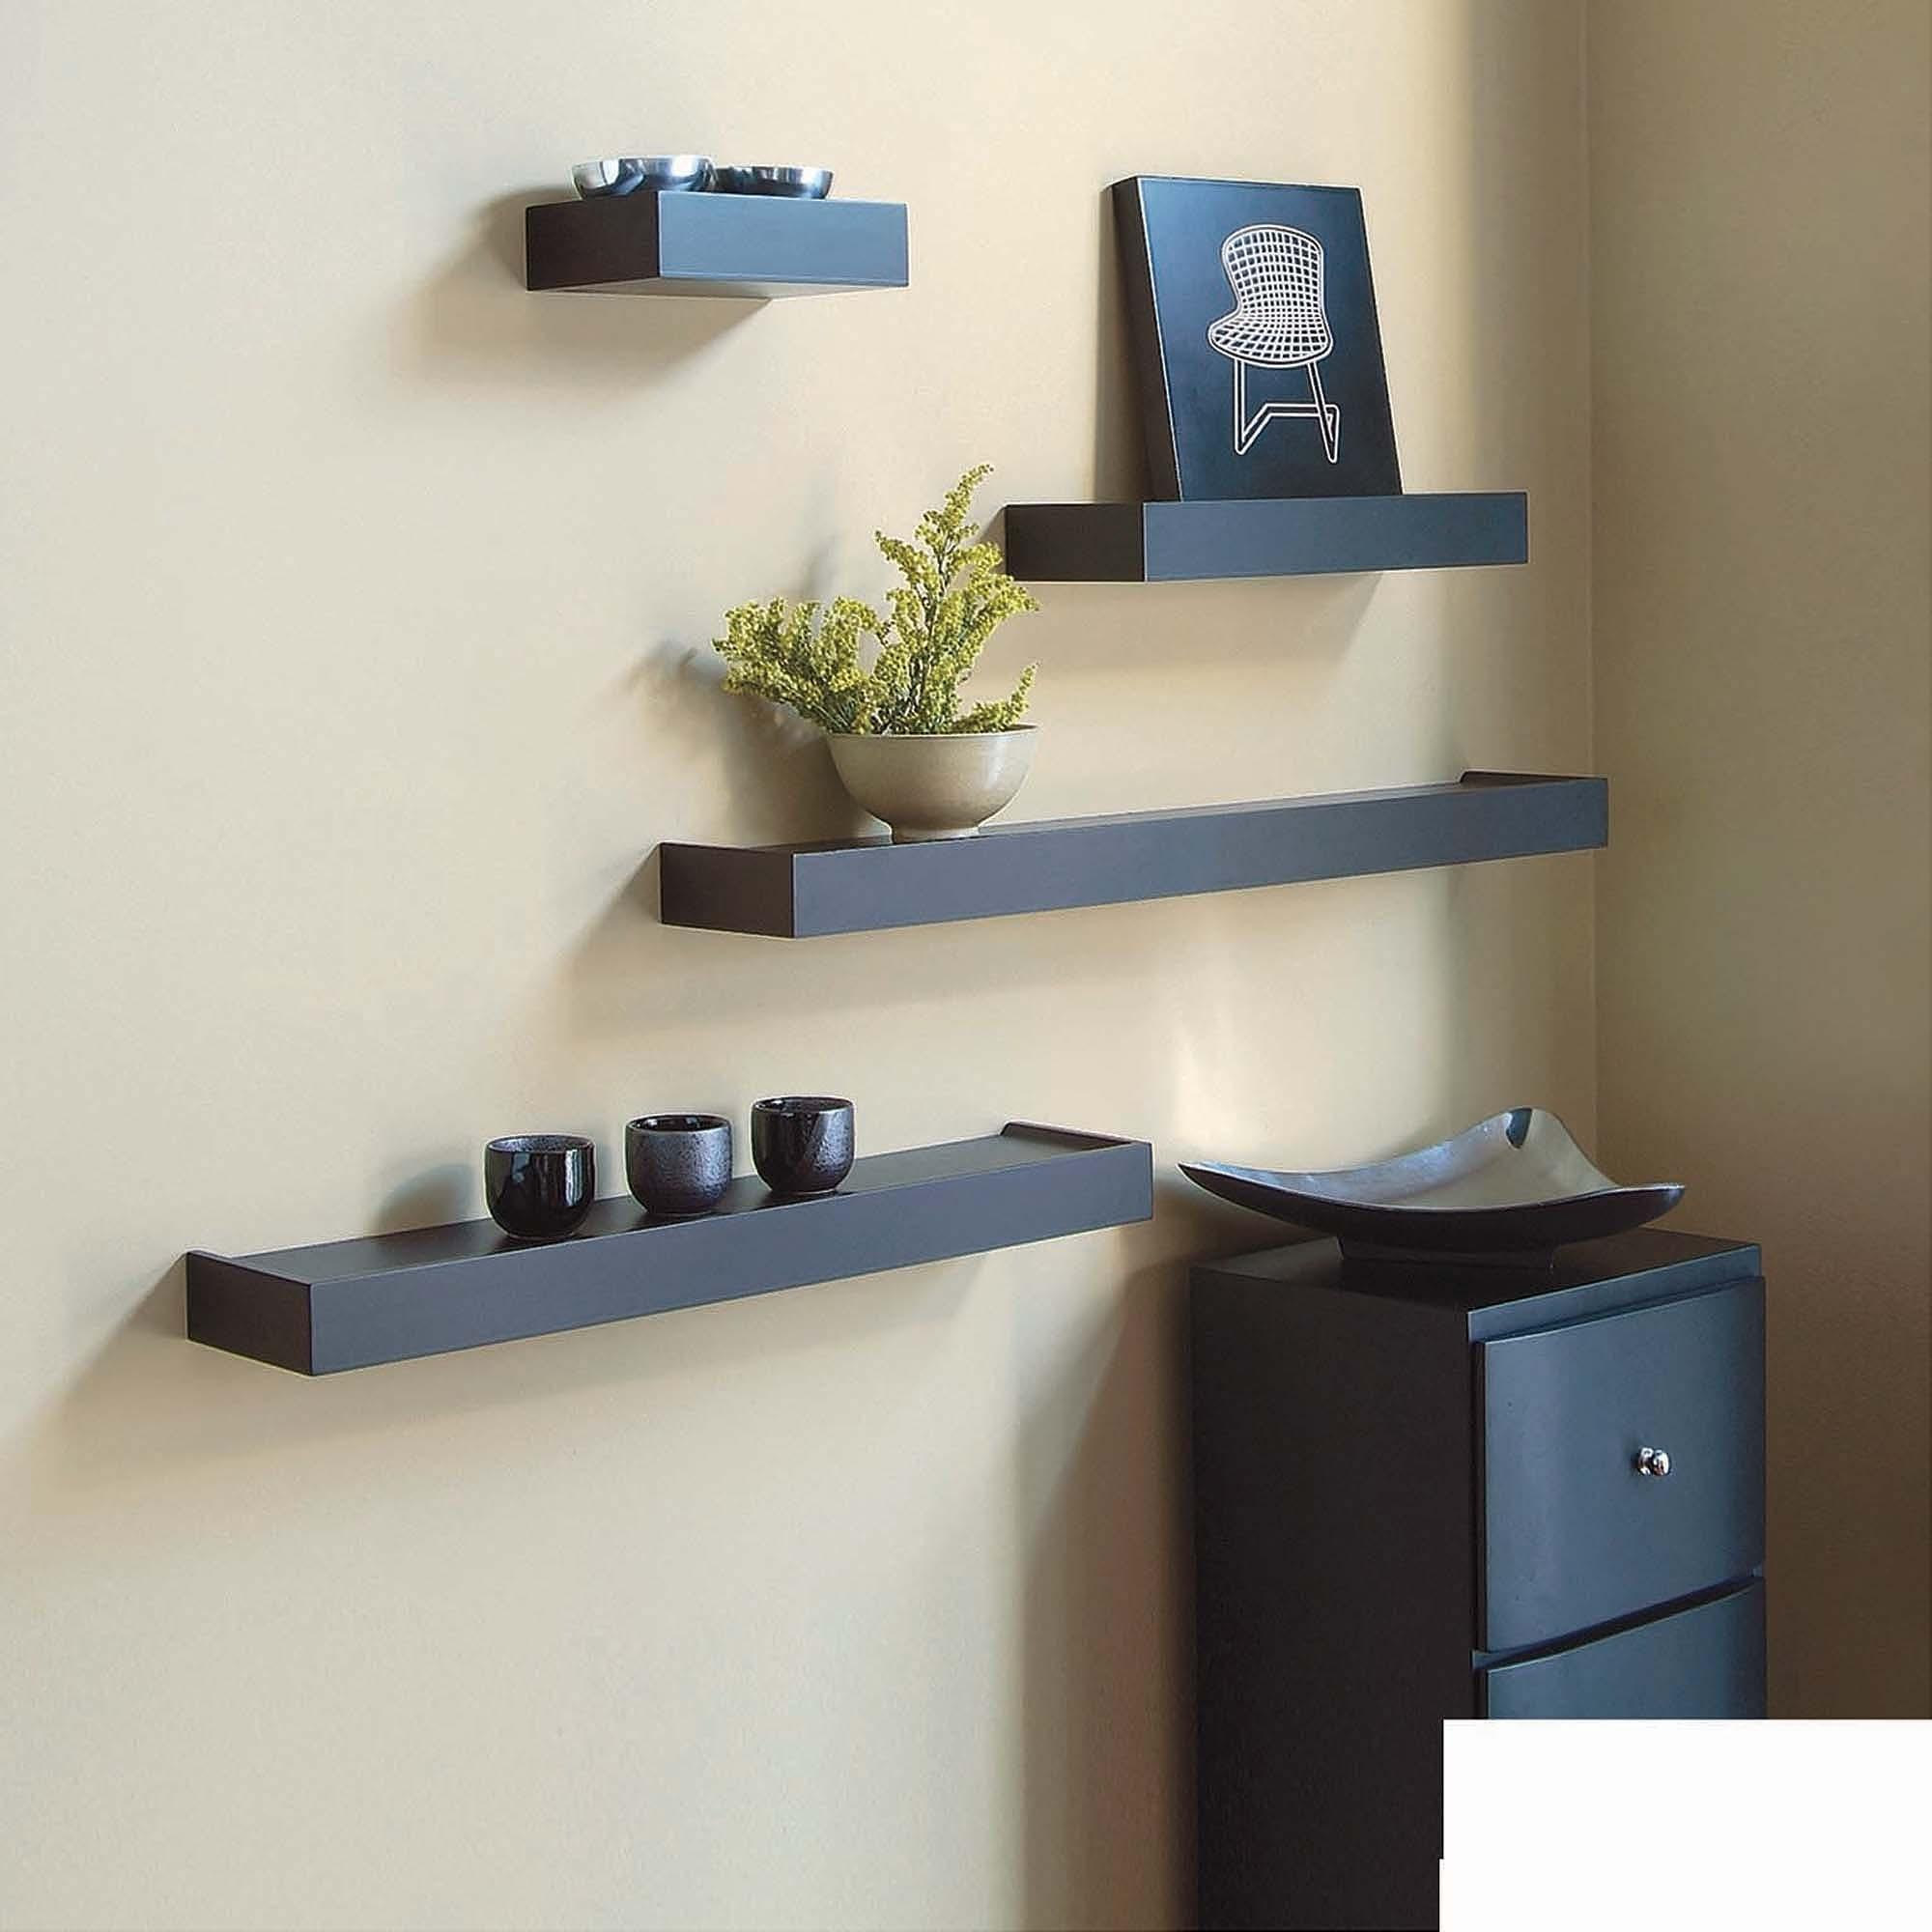 kiera Grace Vertigo set of 4 espresso wall shelves, 6 KVTYAIZ